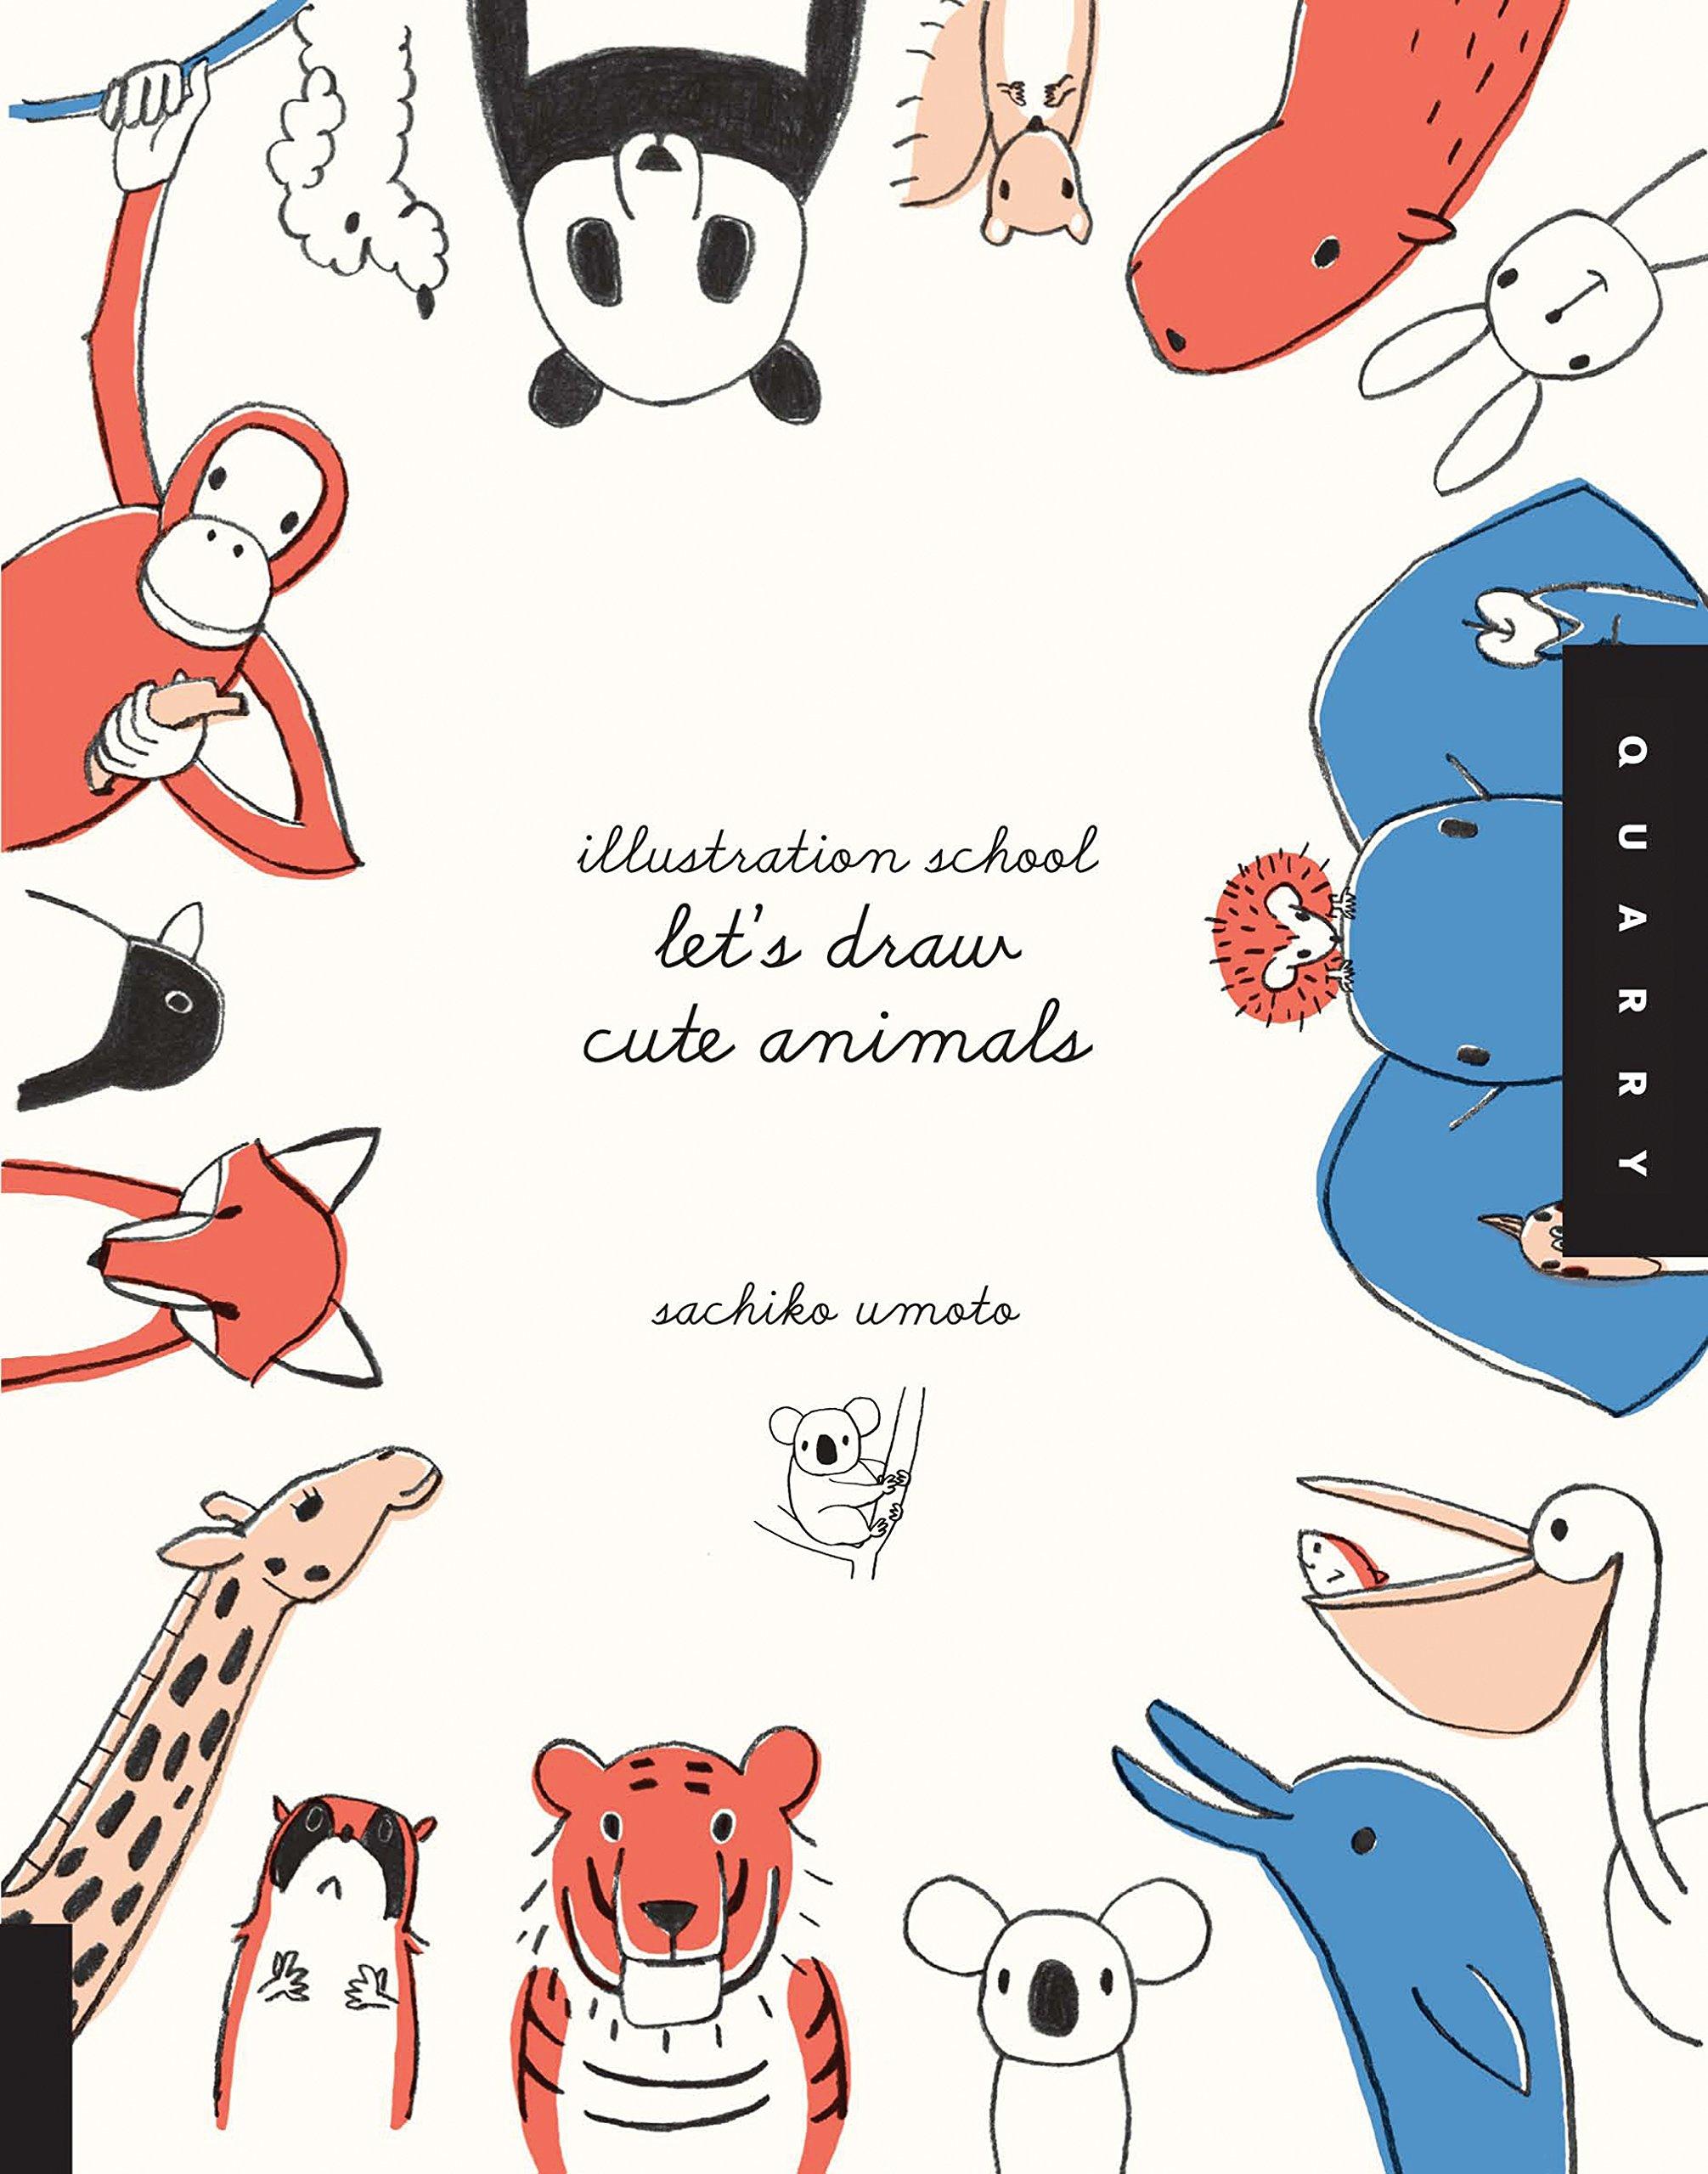 Illustration School Lets Draw Cute Animals Sachiko Umoto